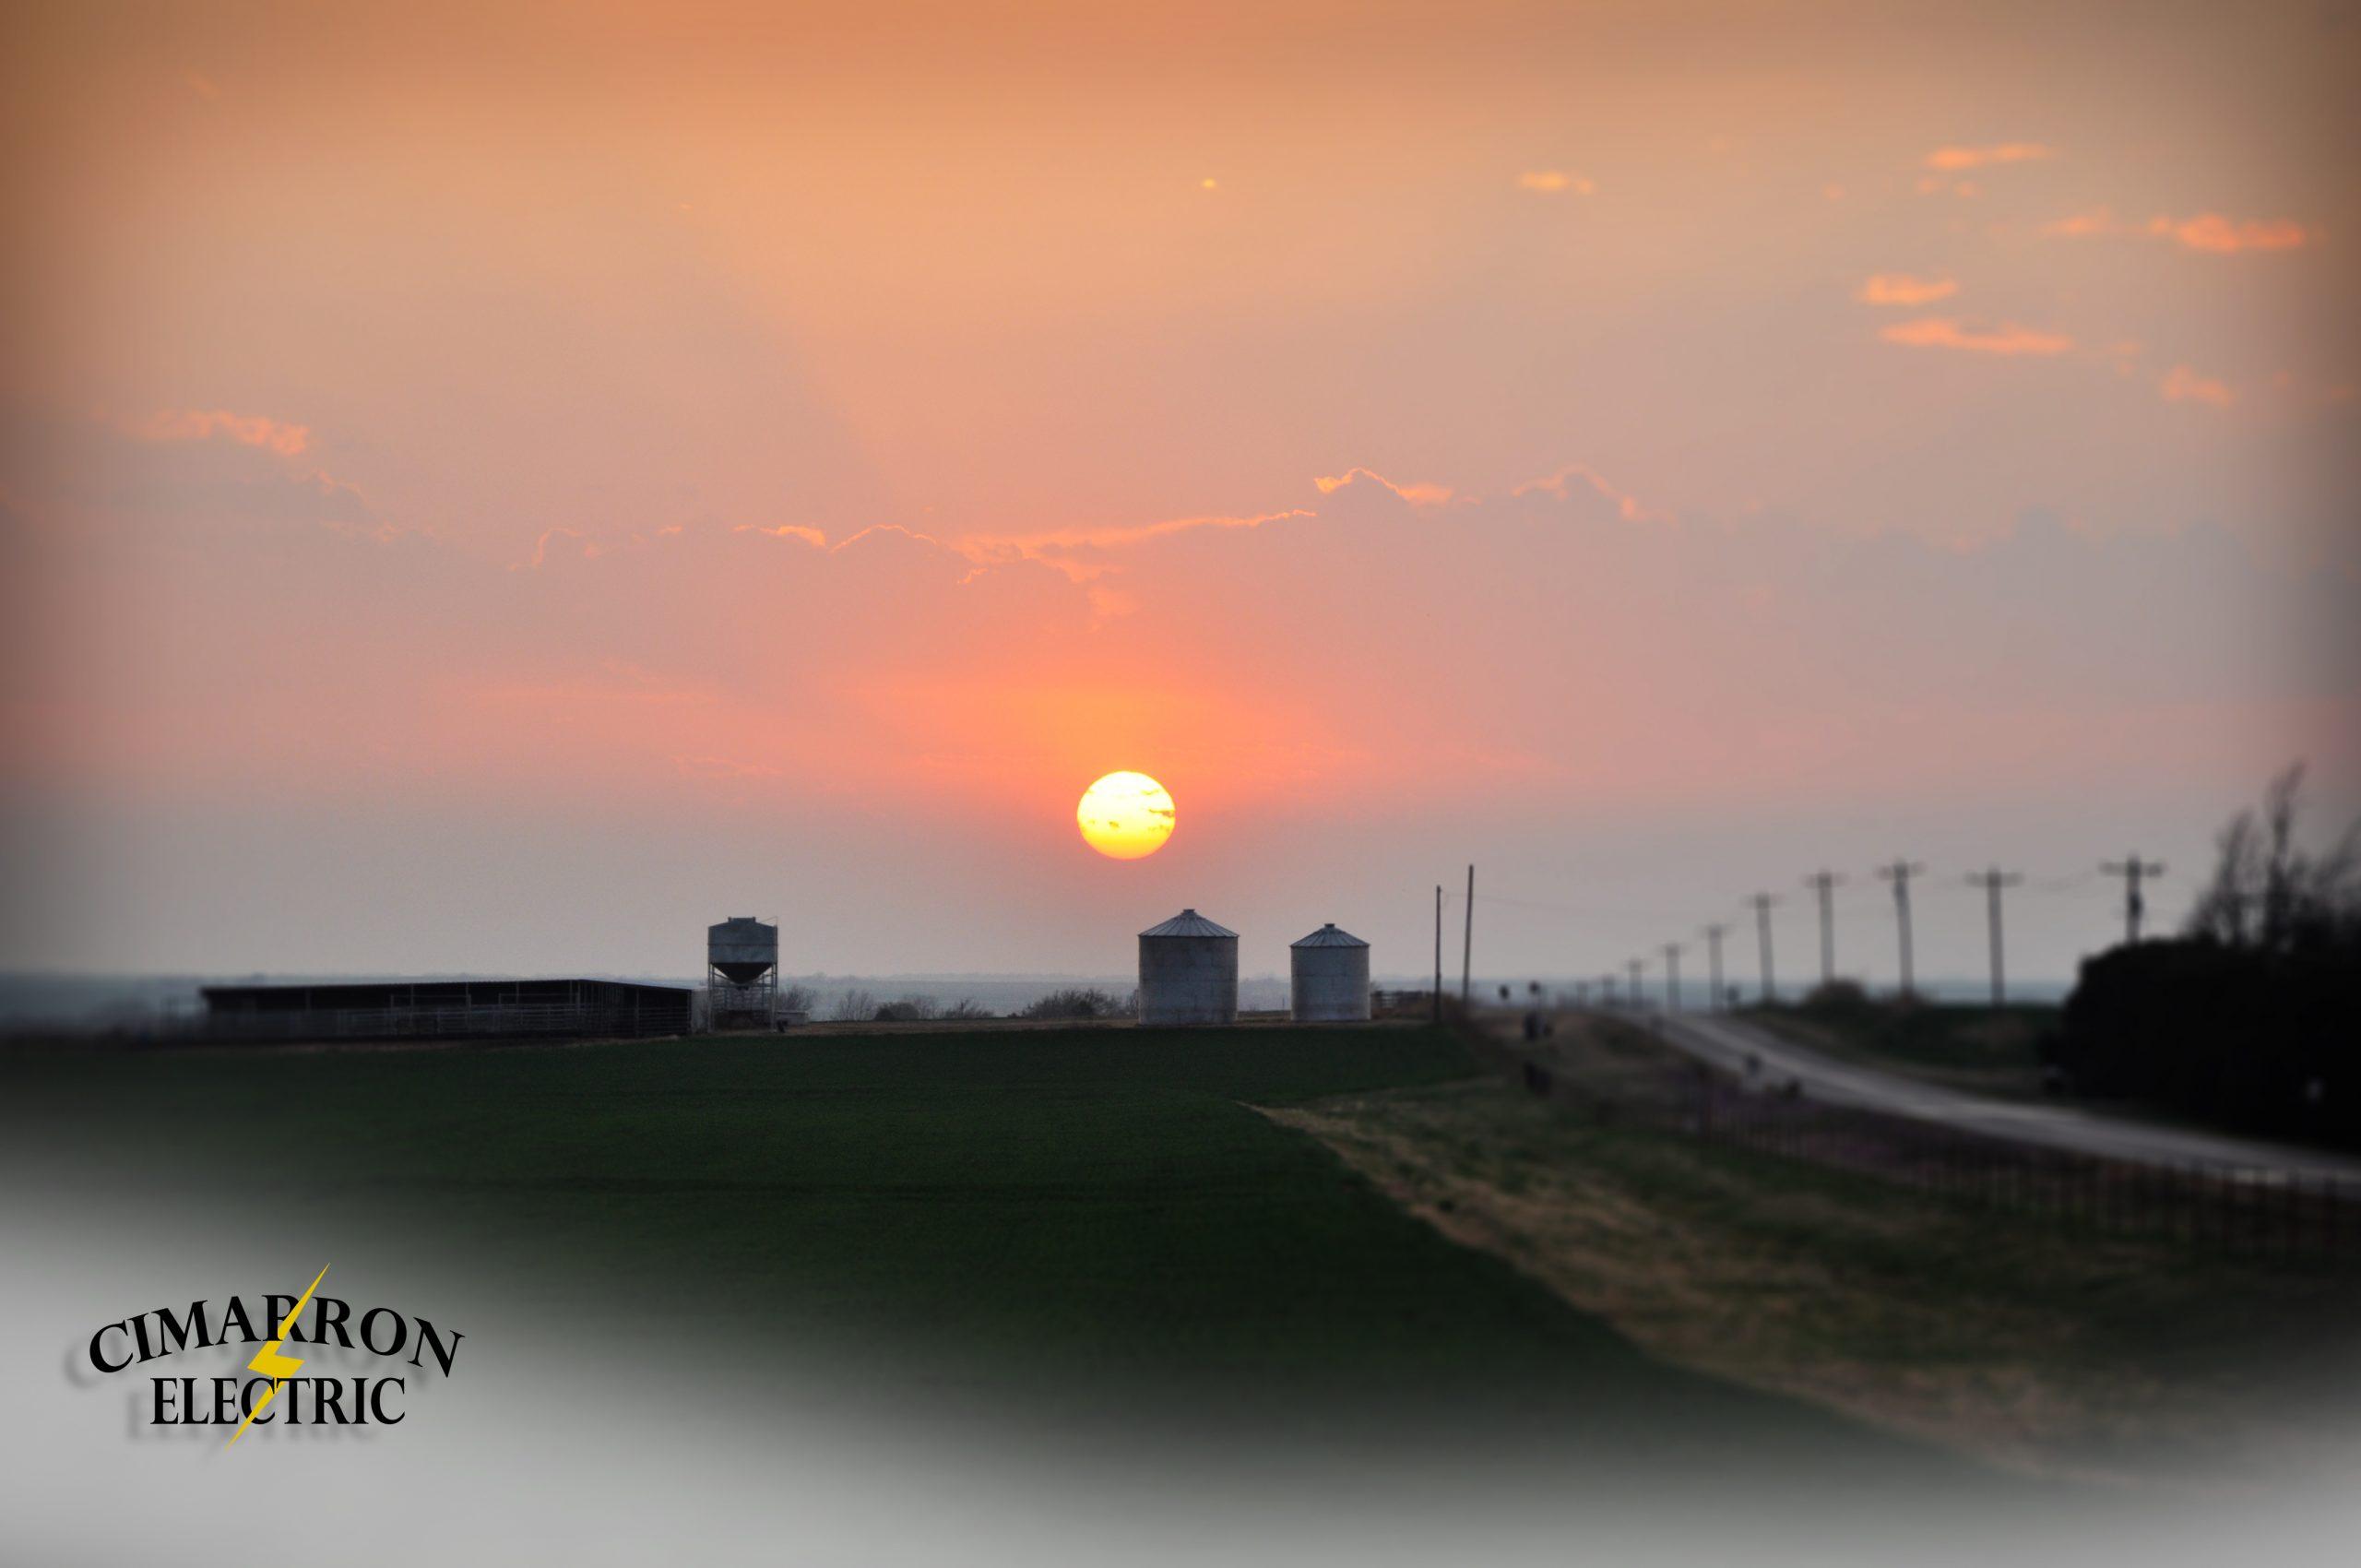 sunset over grain bins